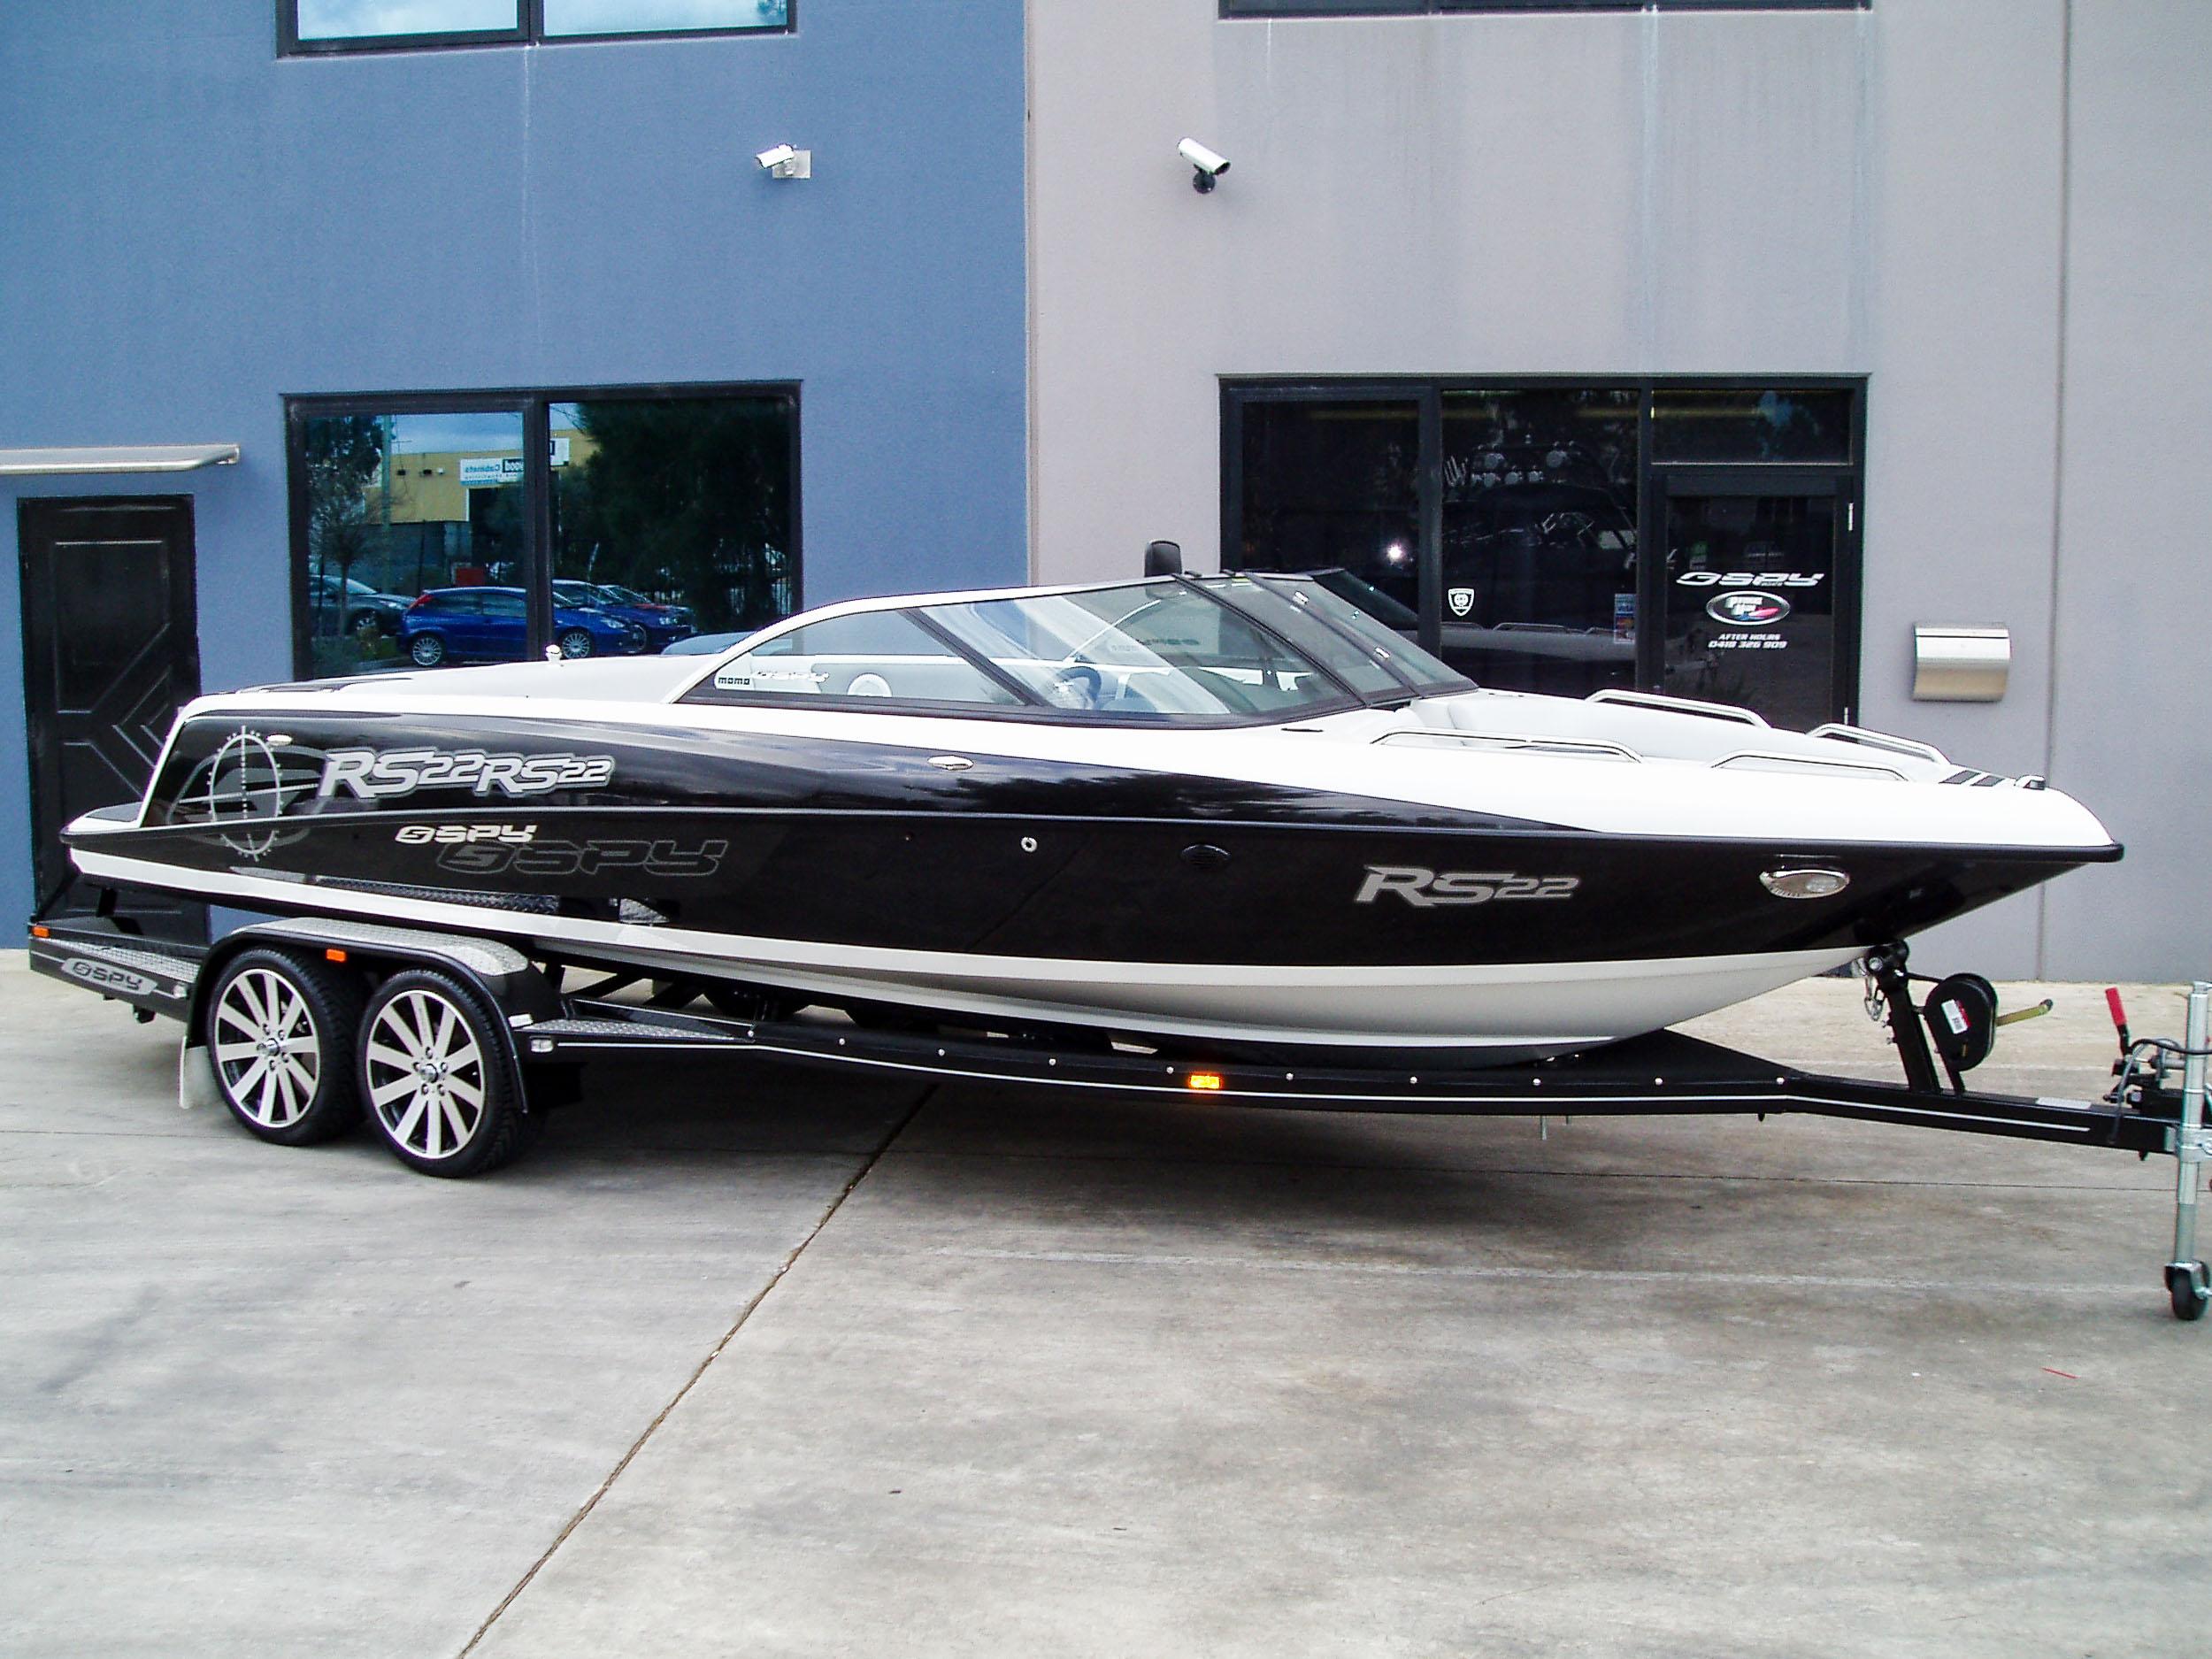 Spy_Boats_RS22-21.jpg